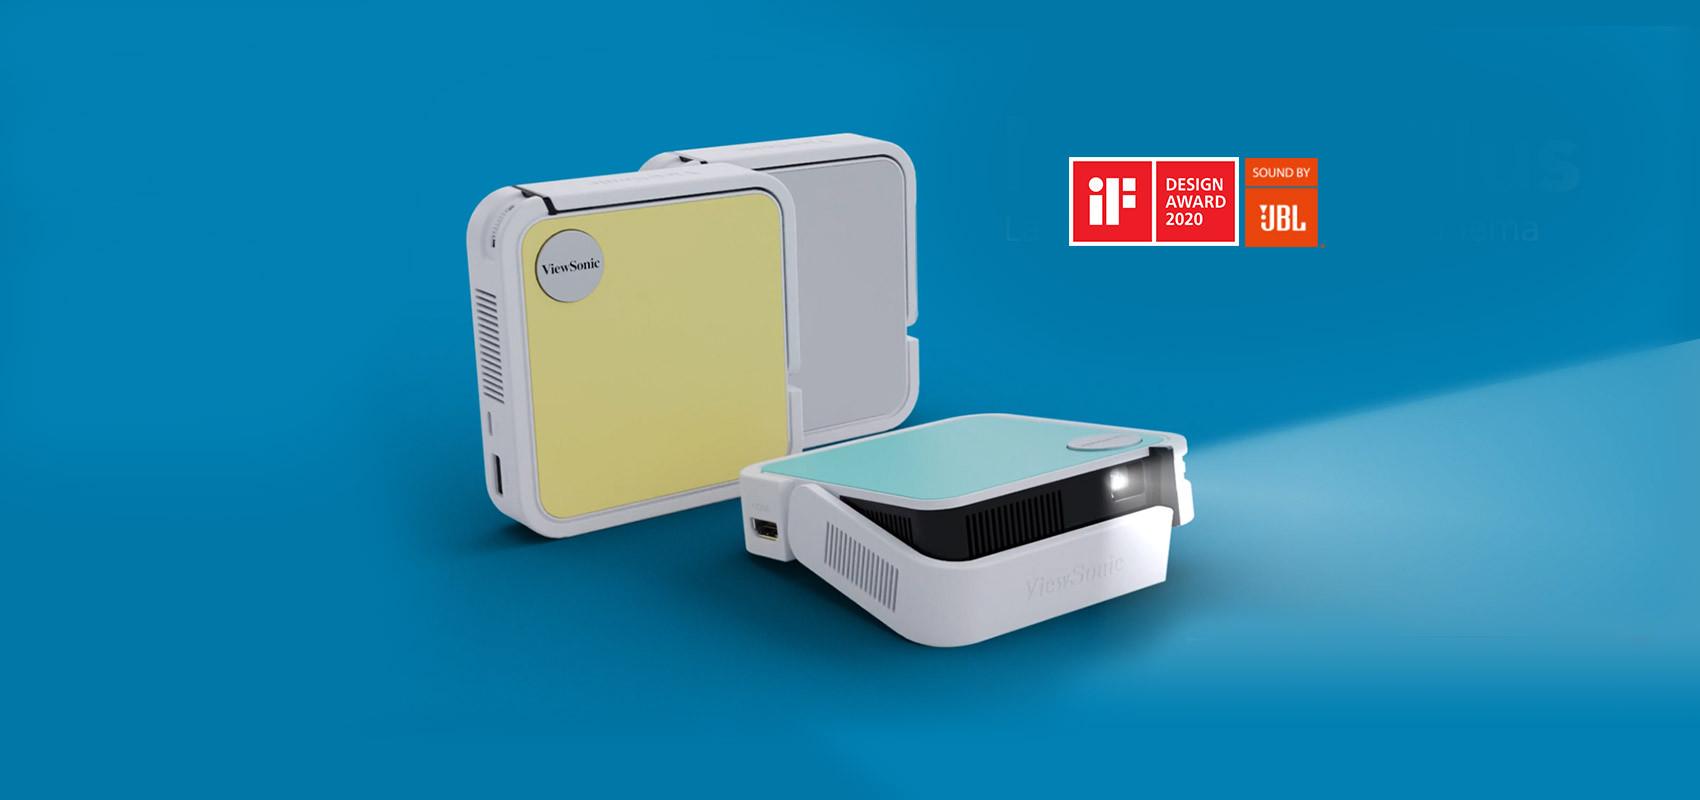 ViewSonic Smart LED Projectors